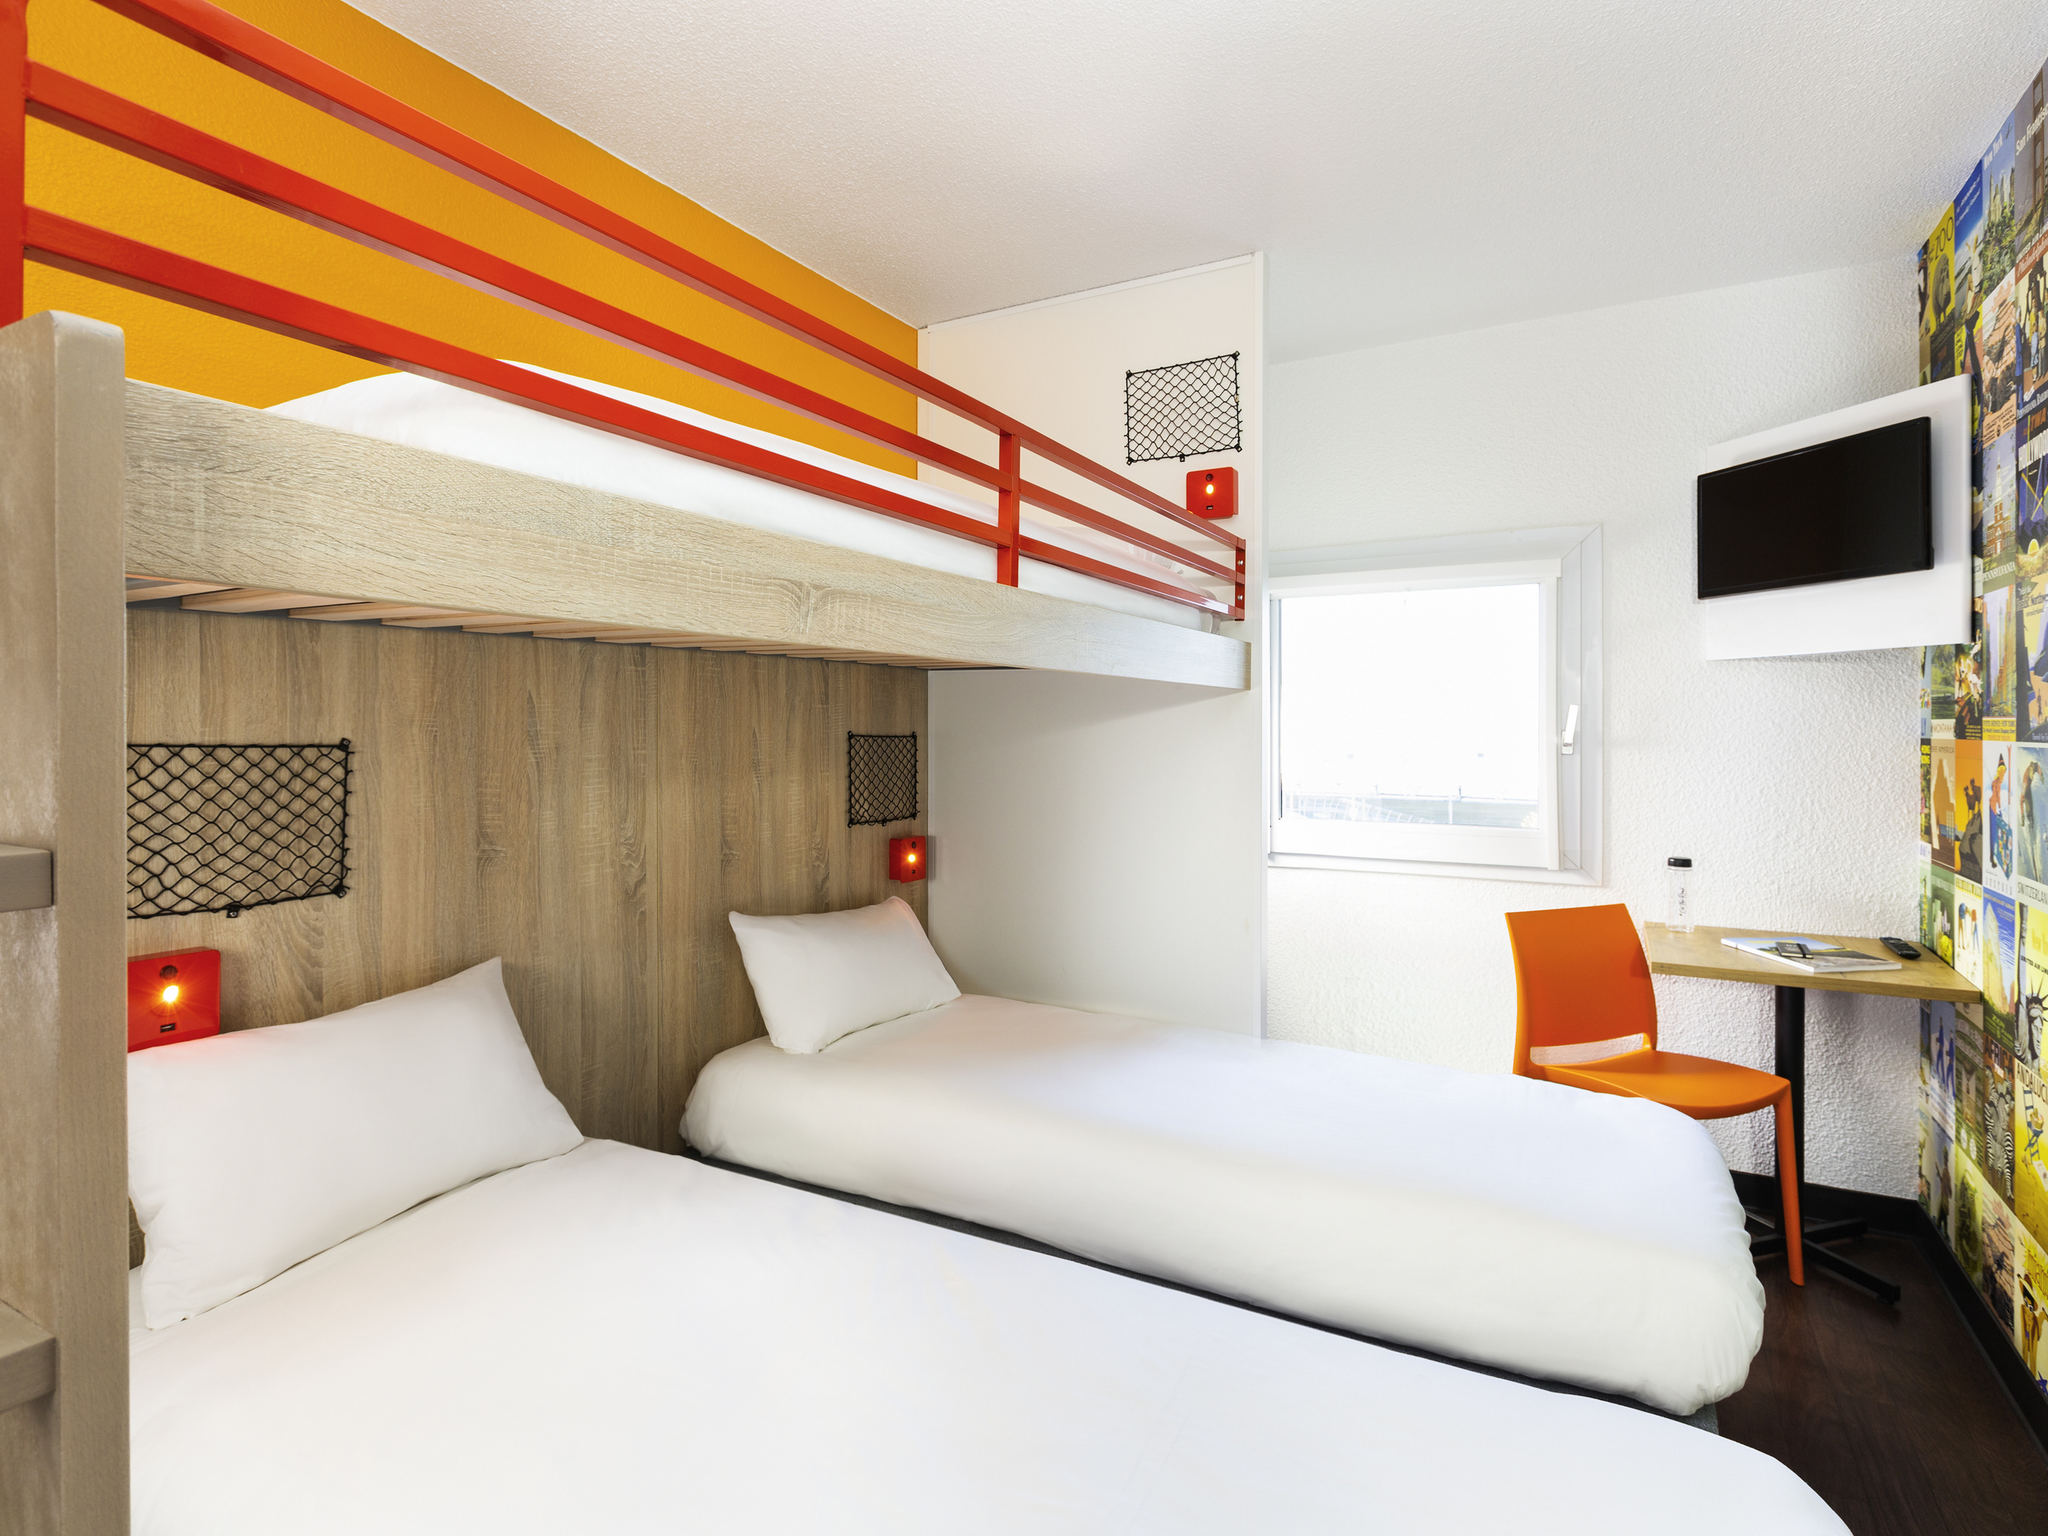 Hotel - hotelF1 Avignon Nord